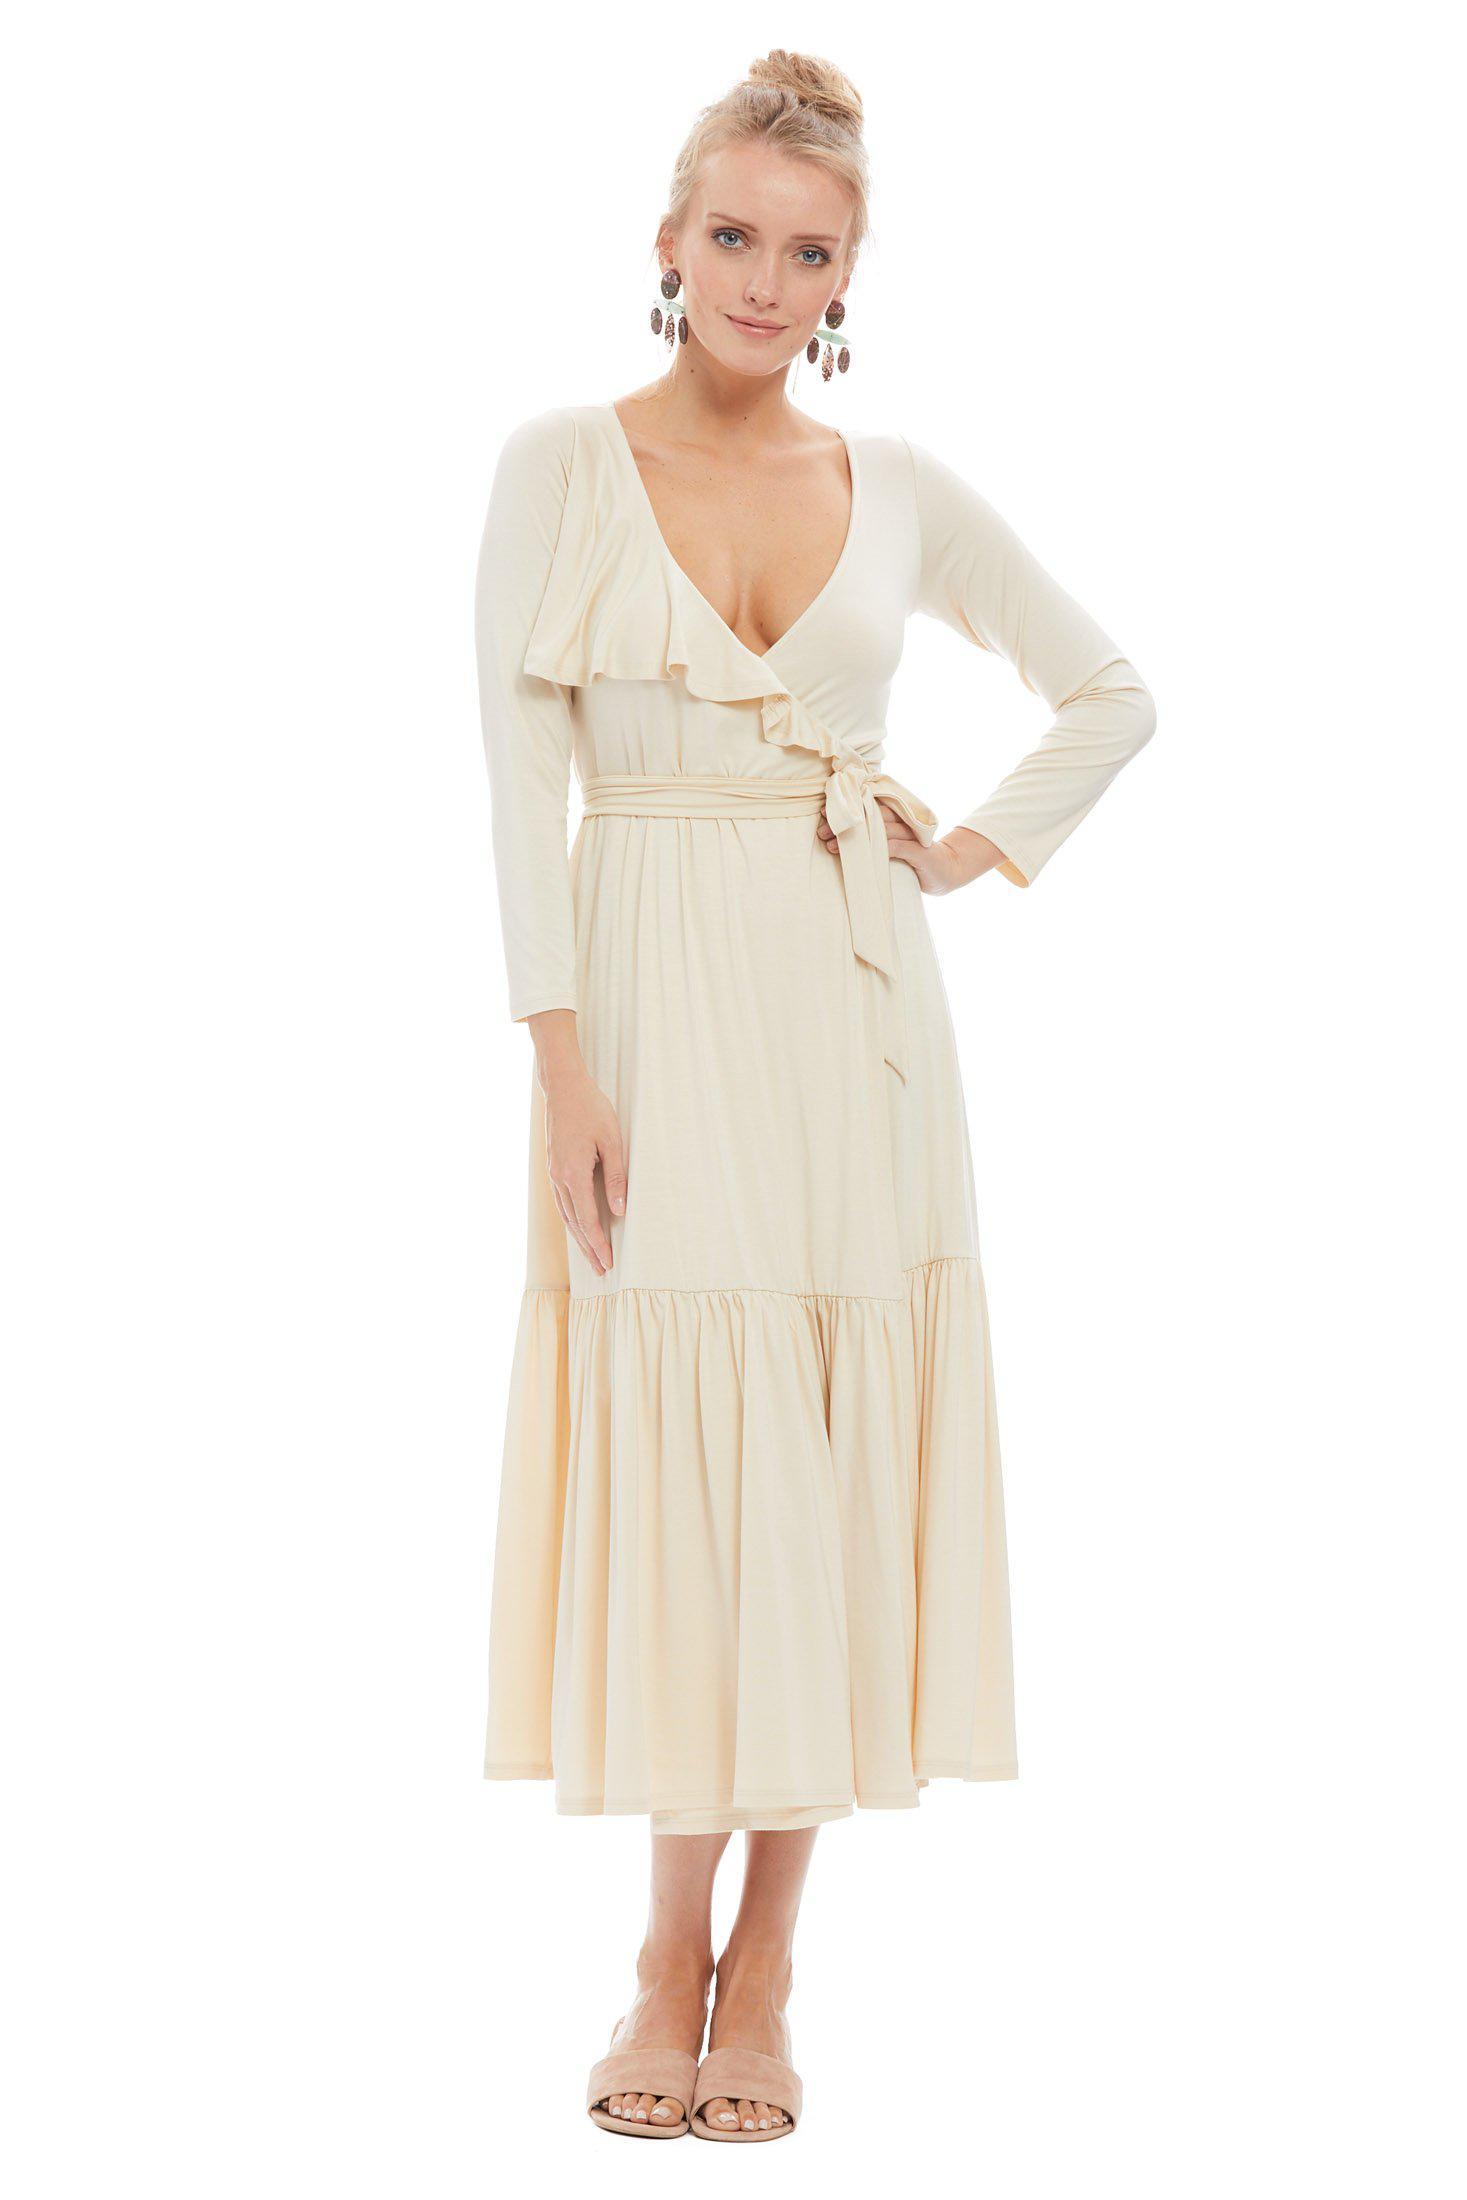 Rachel In Natural Nadine Lyst Wrap Pally Dress Cream fgY7b6yv